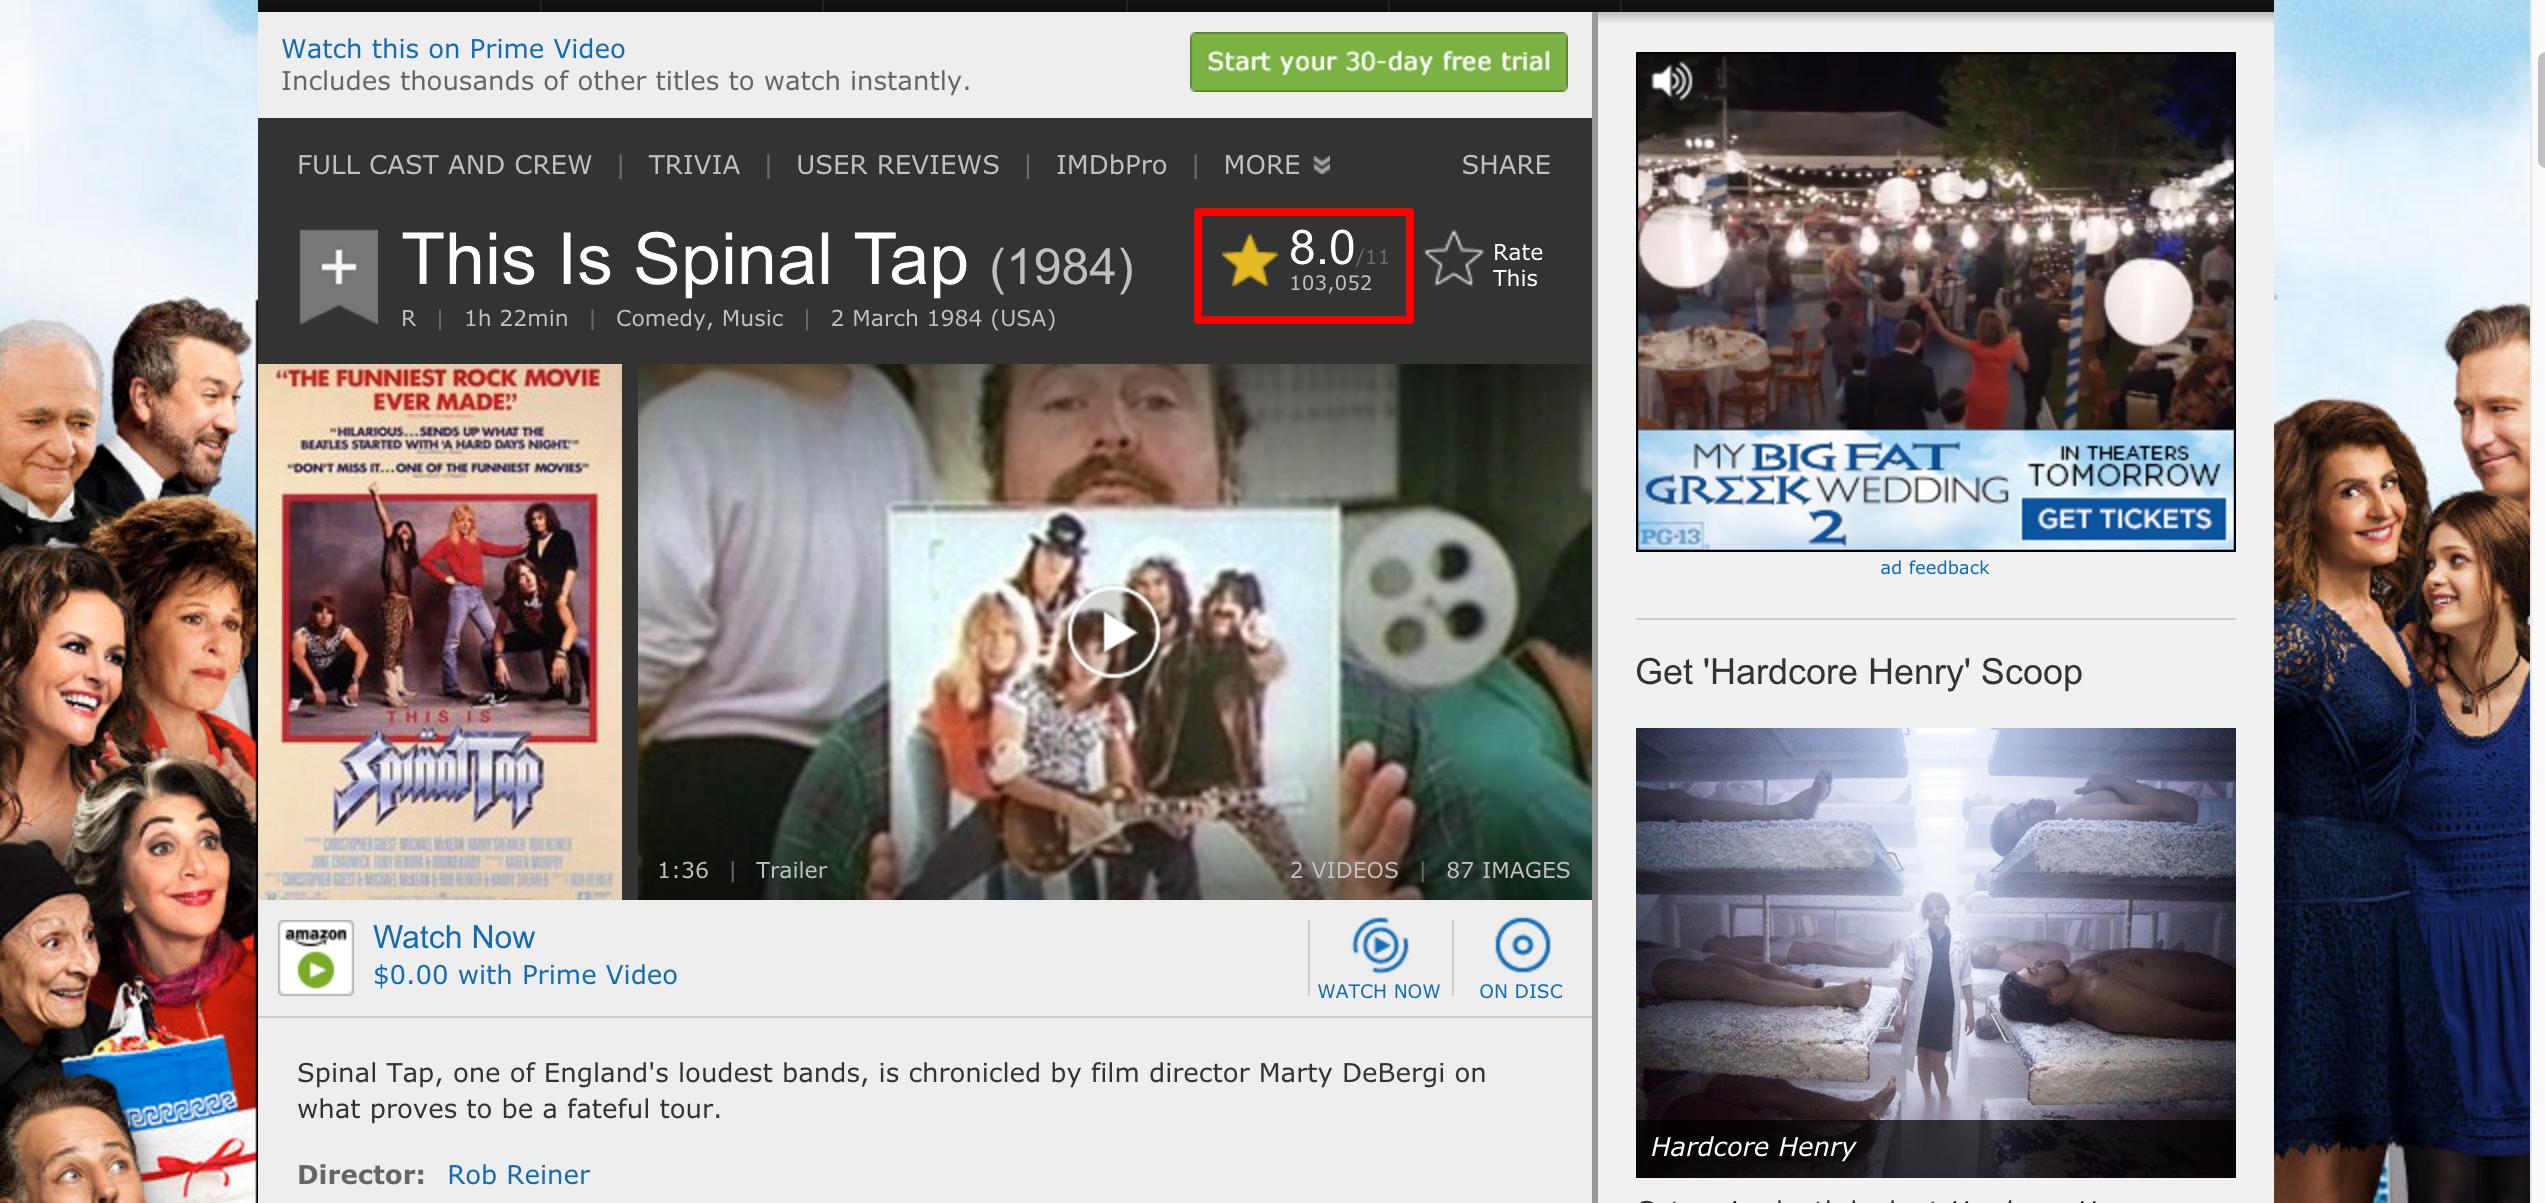 Internet-huevos-de-pascua-imdb-spinal-tap